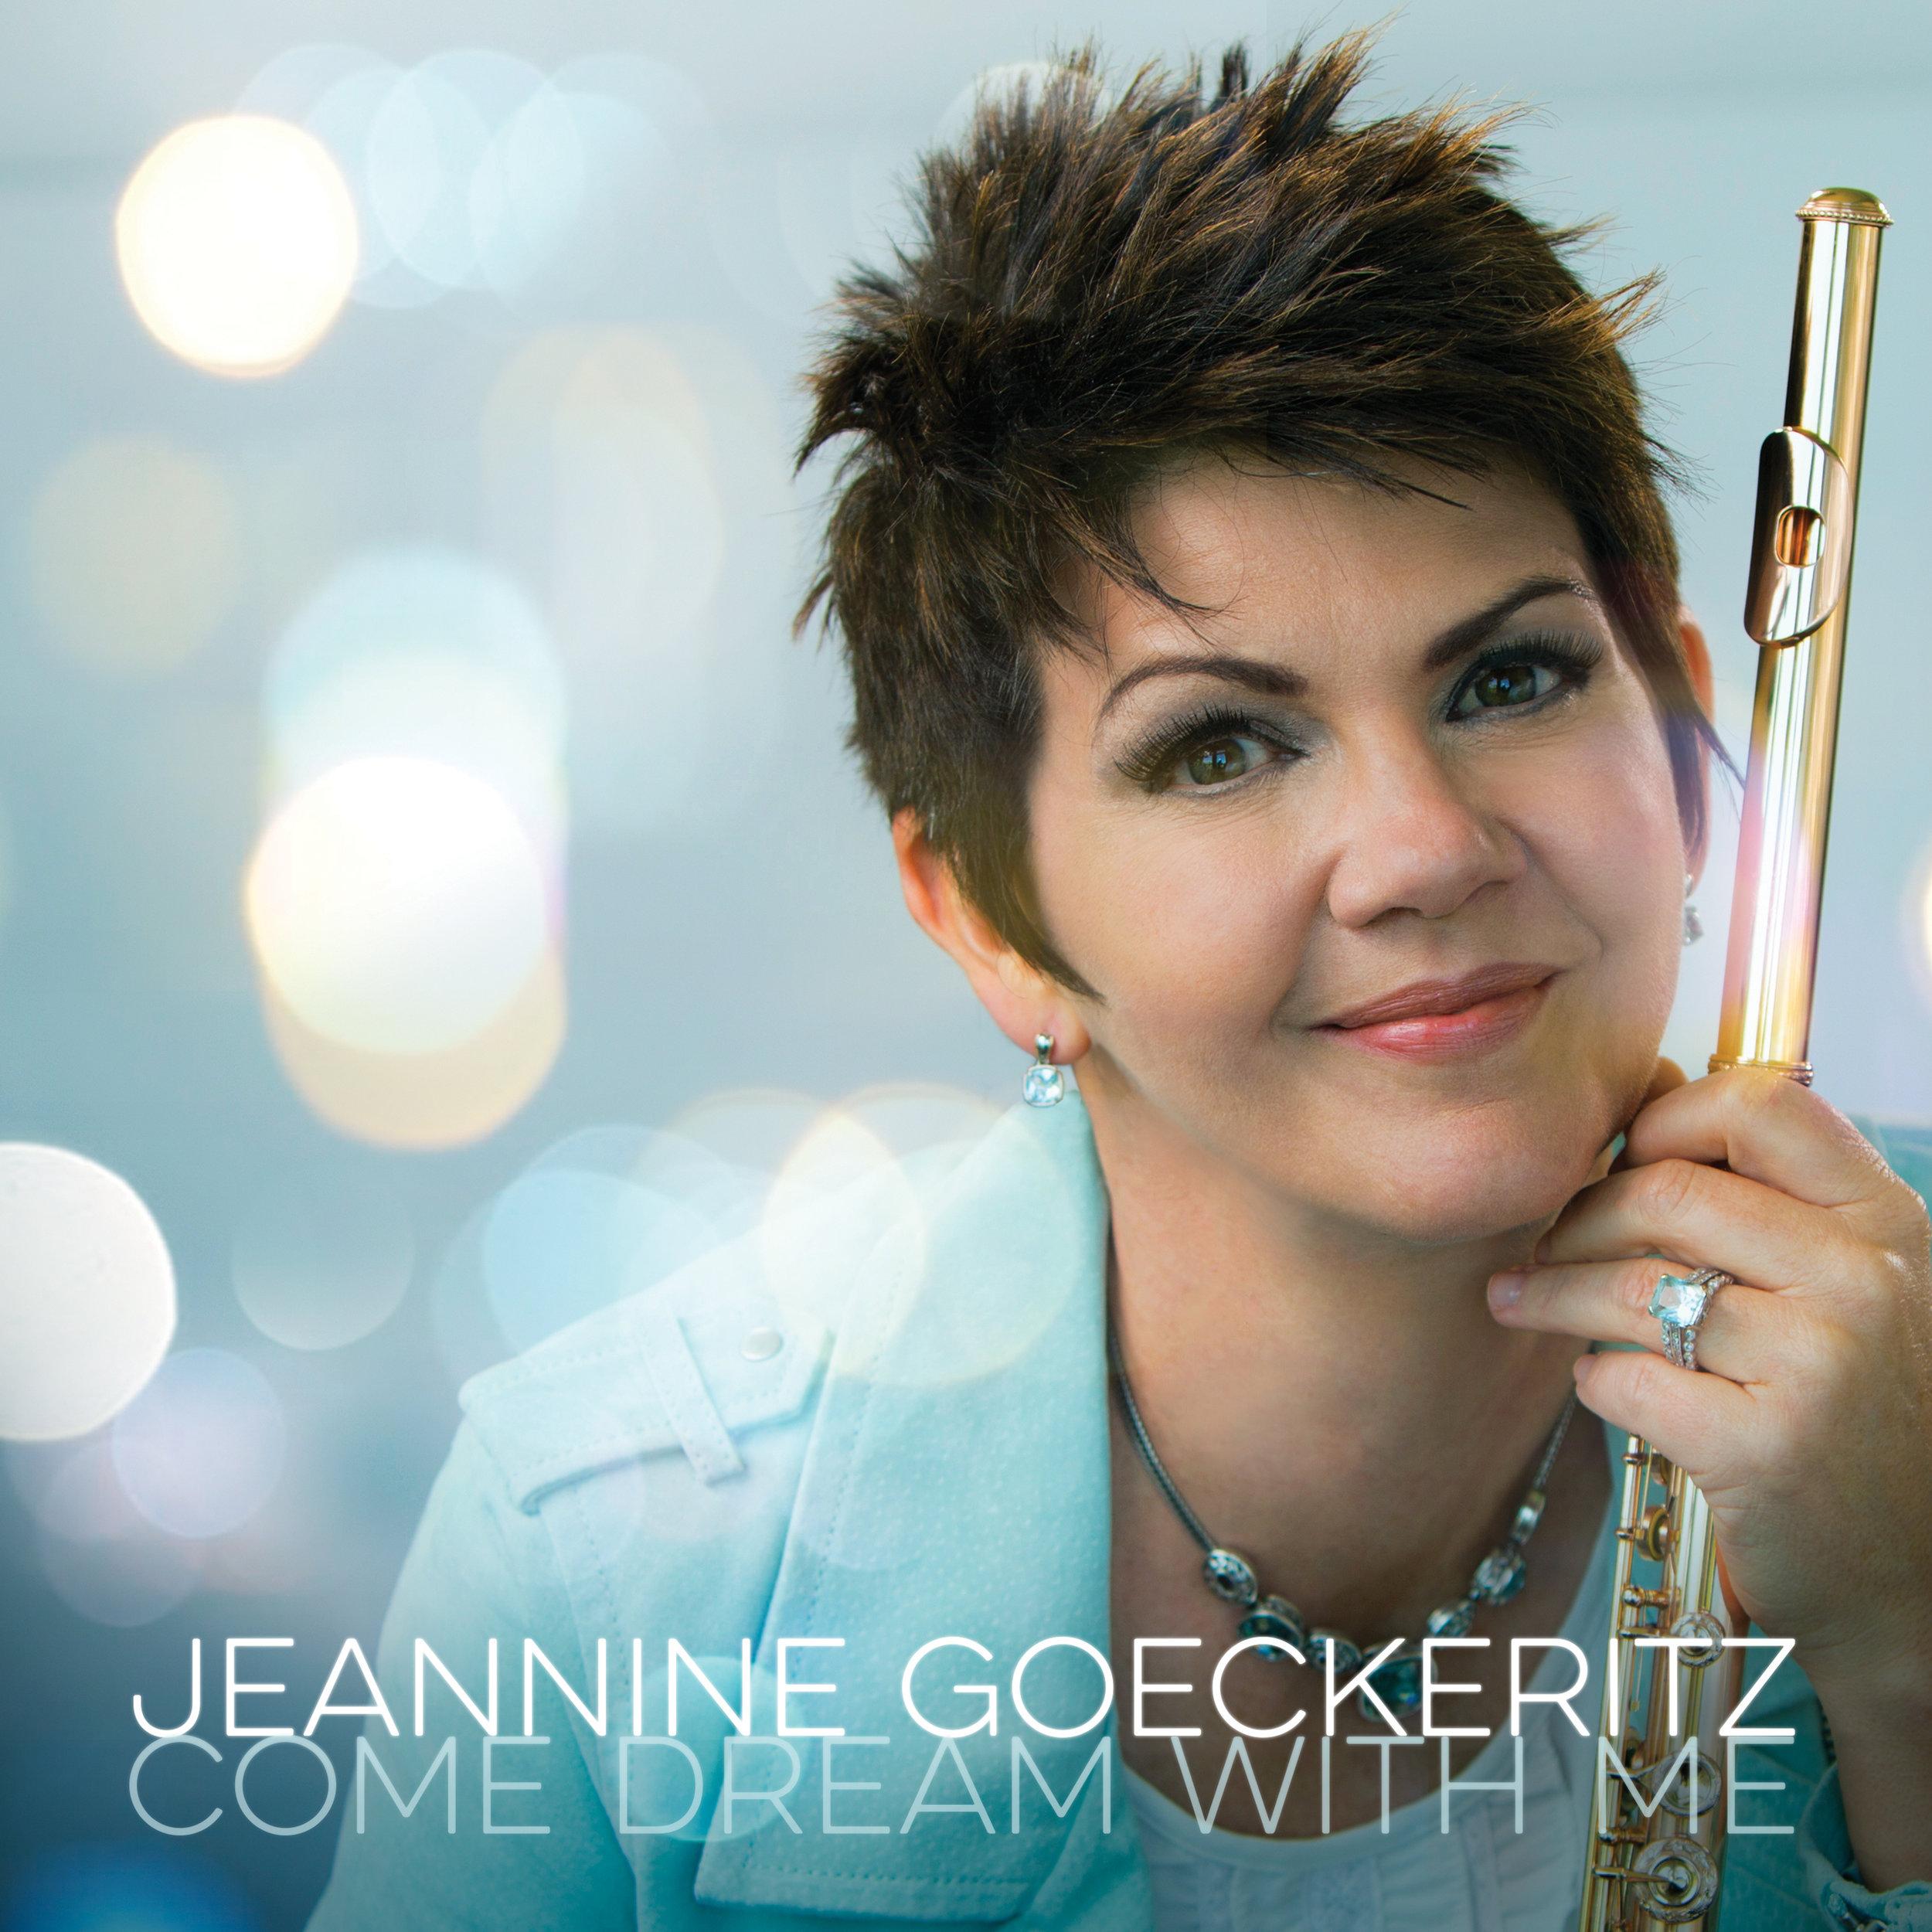 JeannineGoeckeritzPHOTO1-logo.jpg